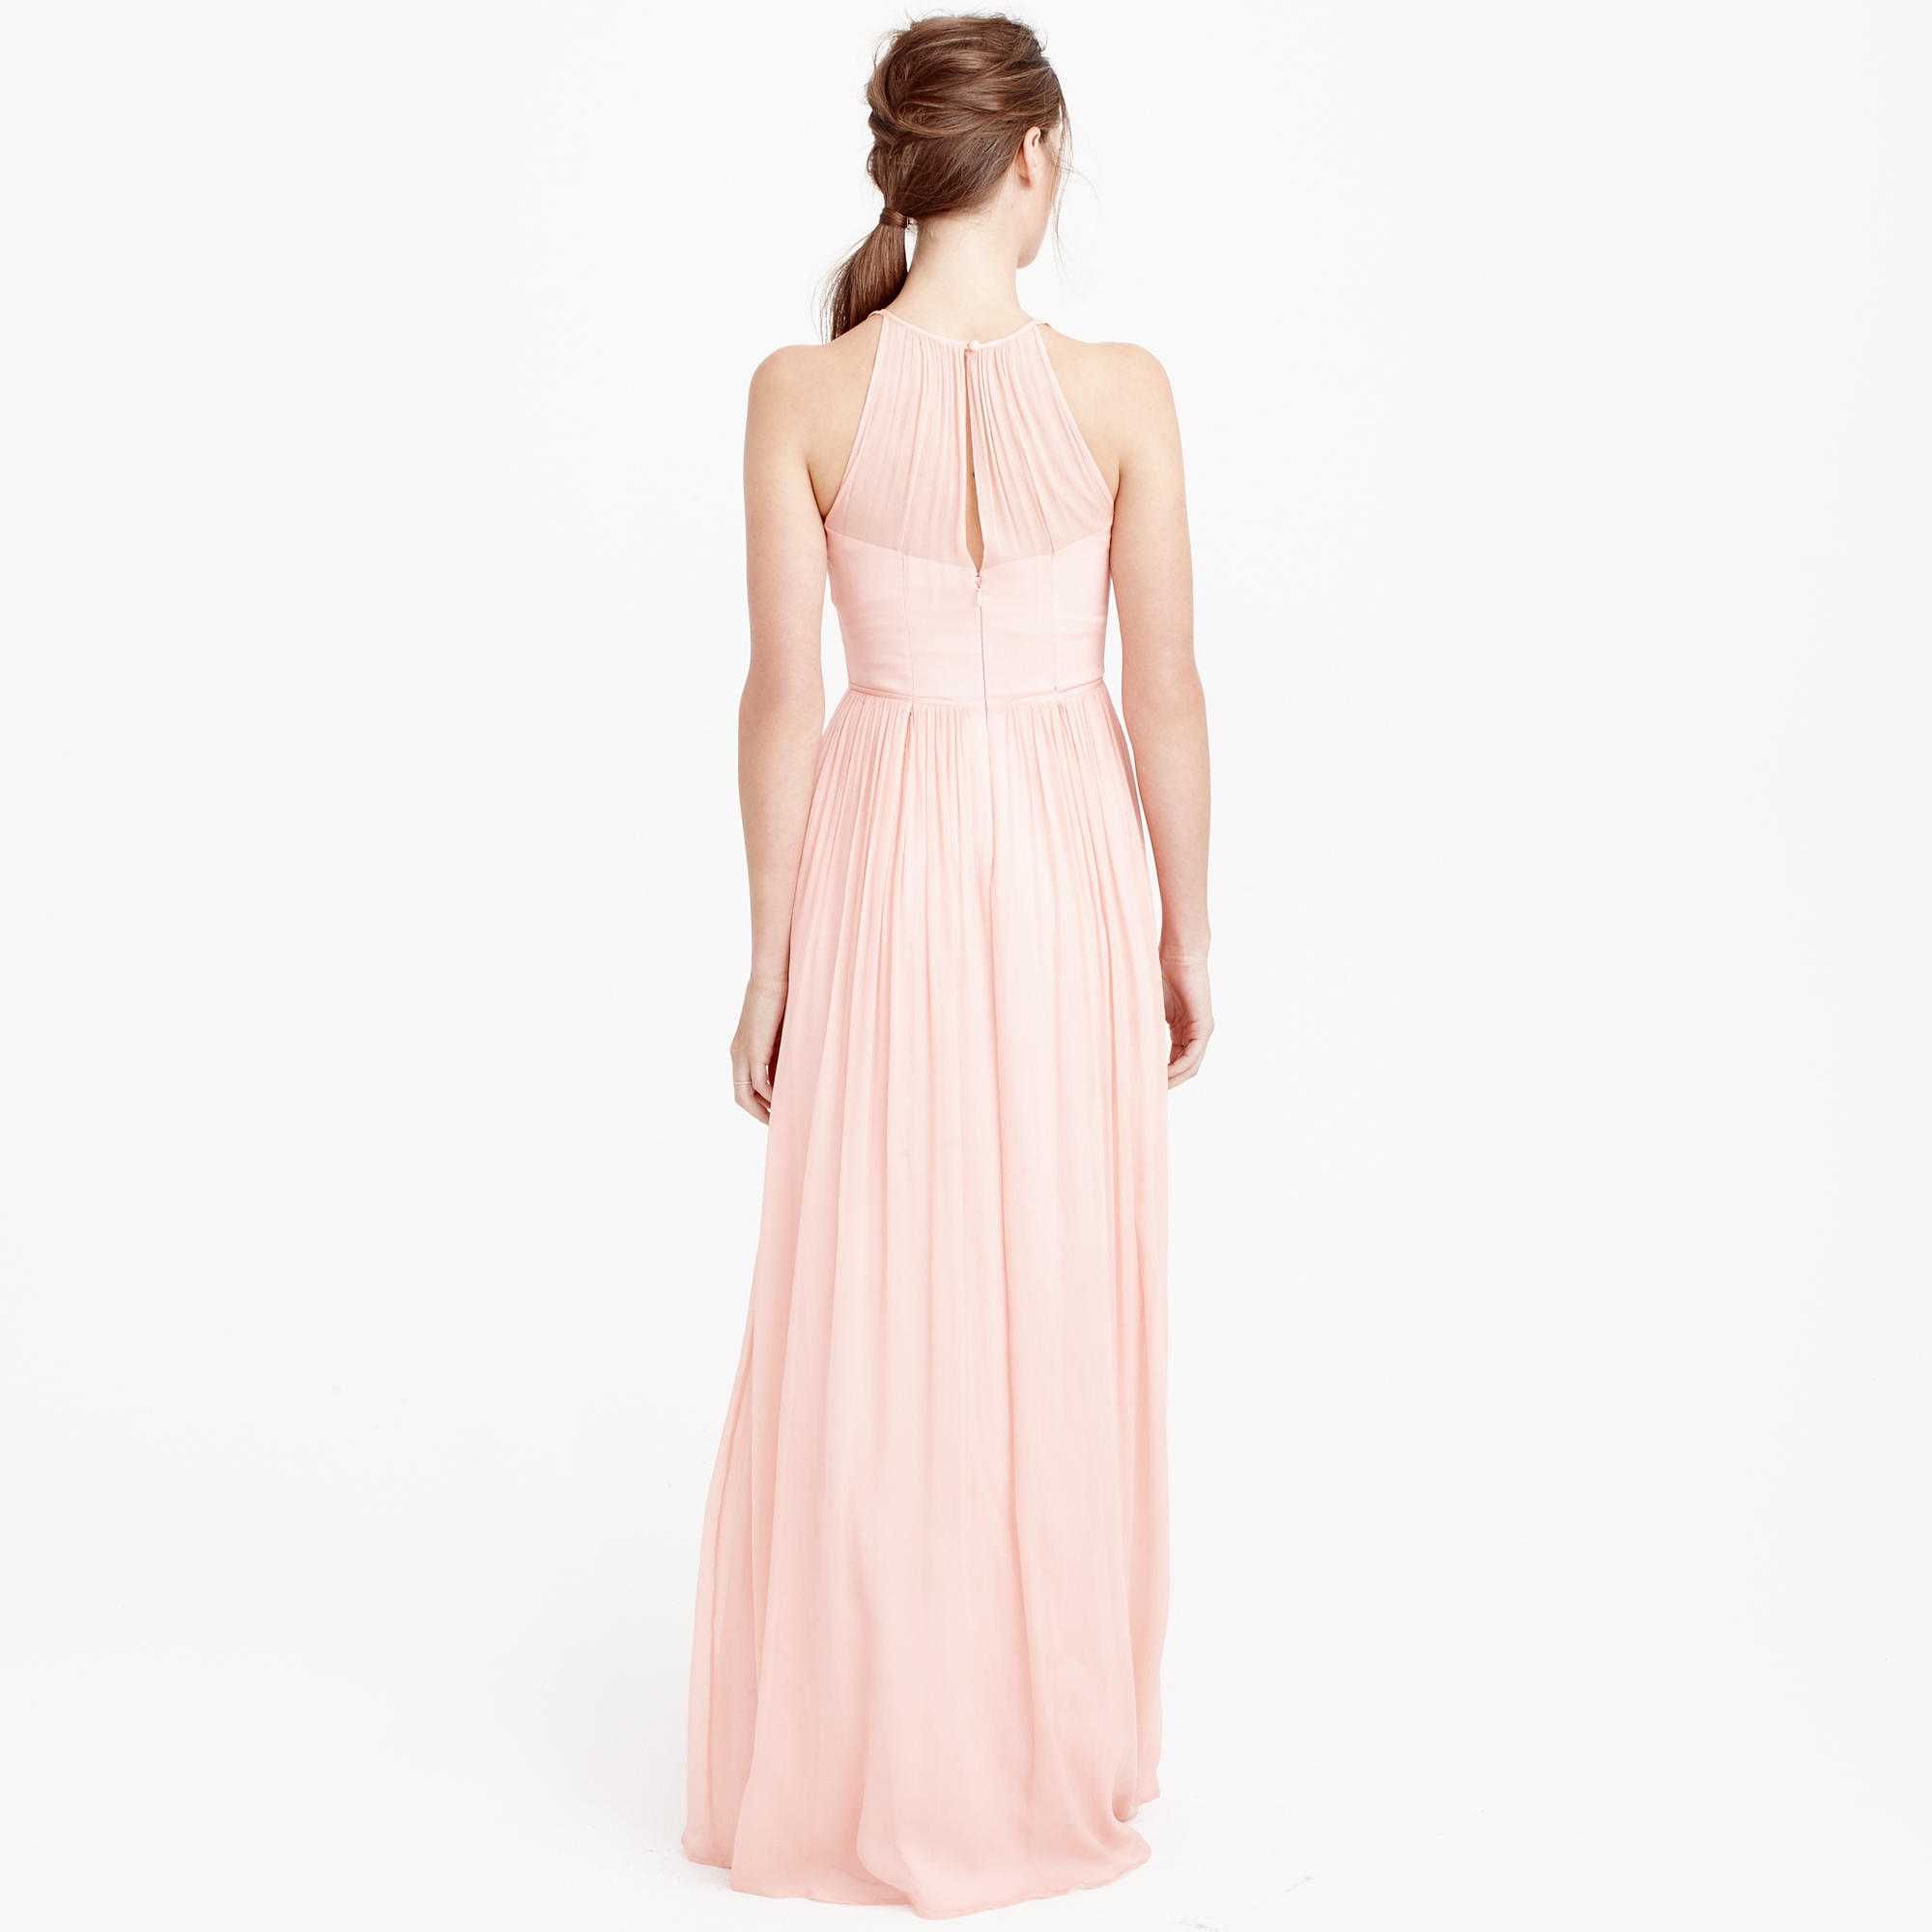 Megan long dress in silk chiffon :  J.Crew